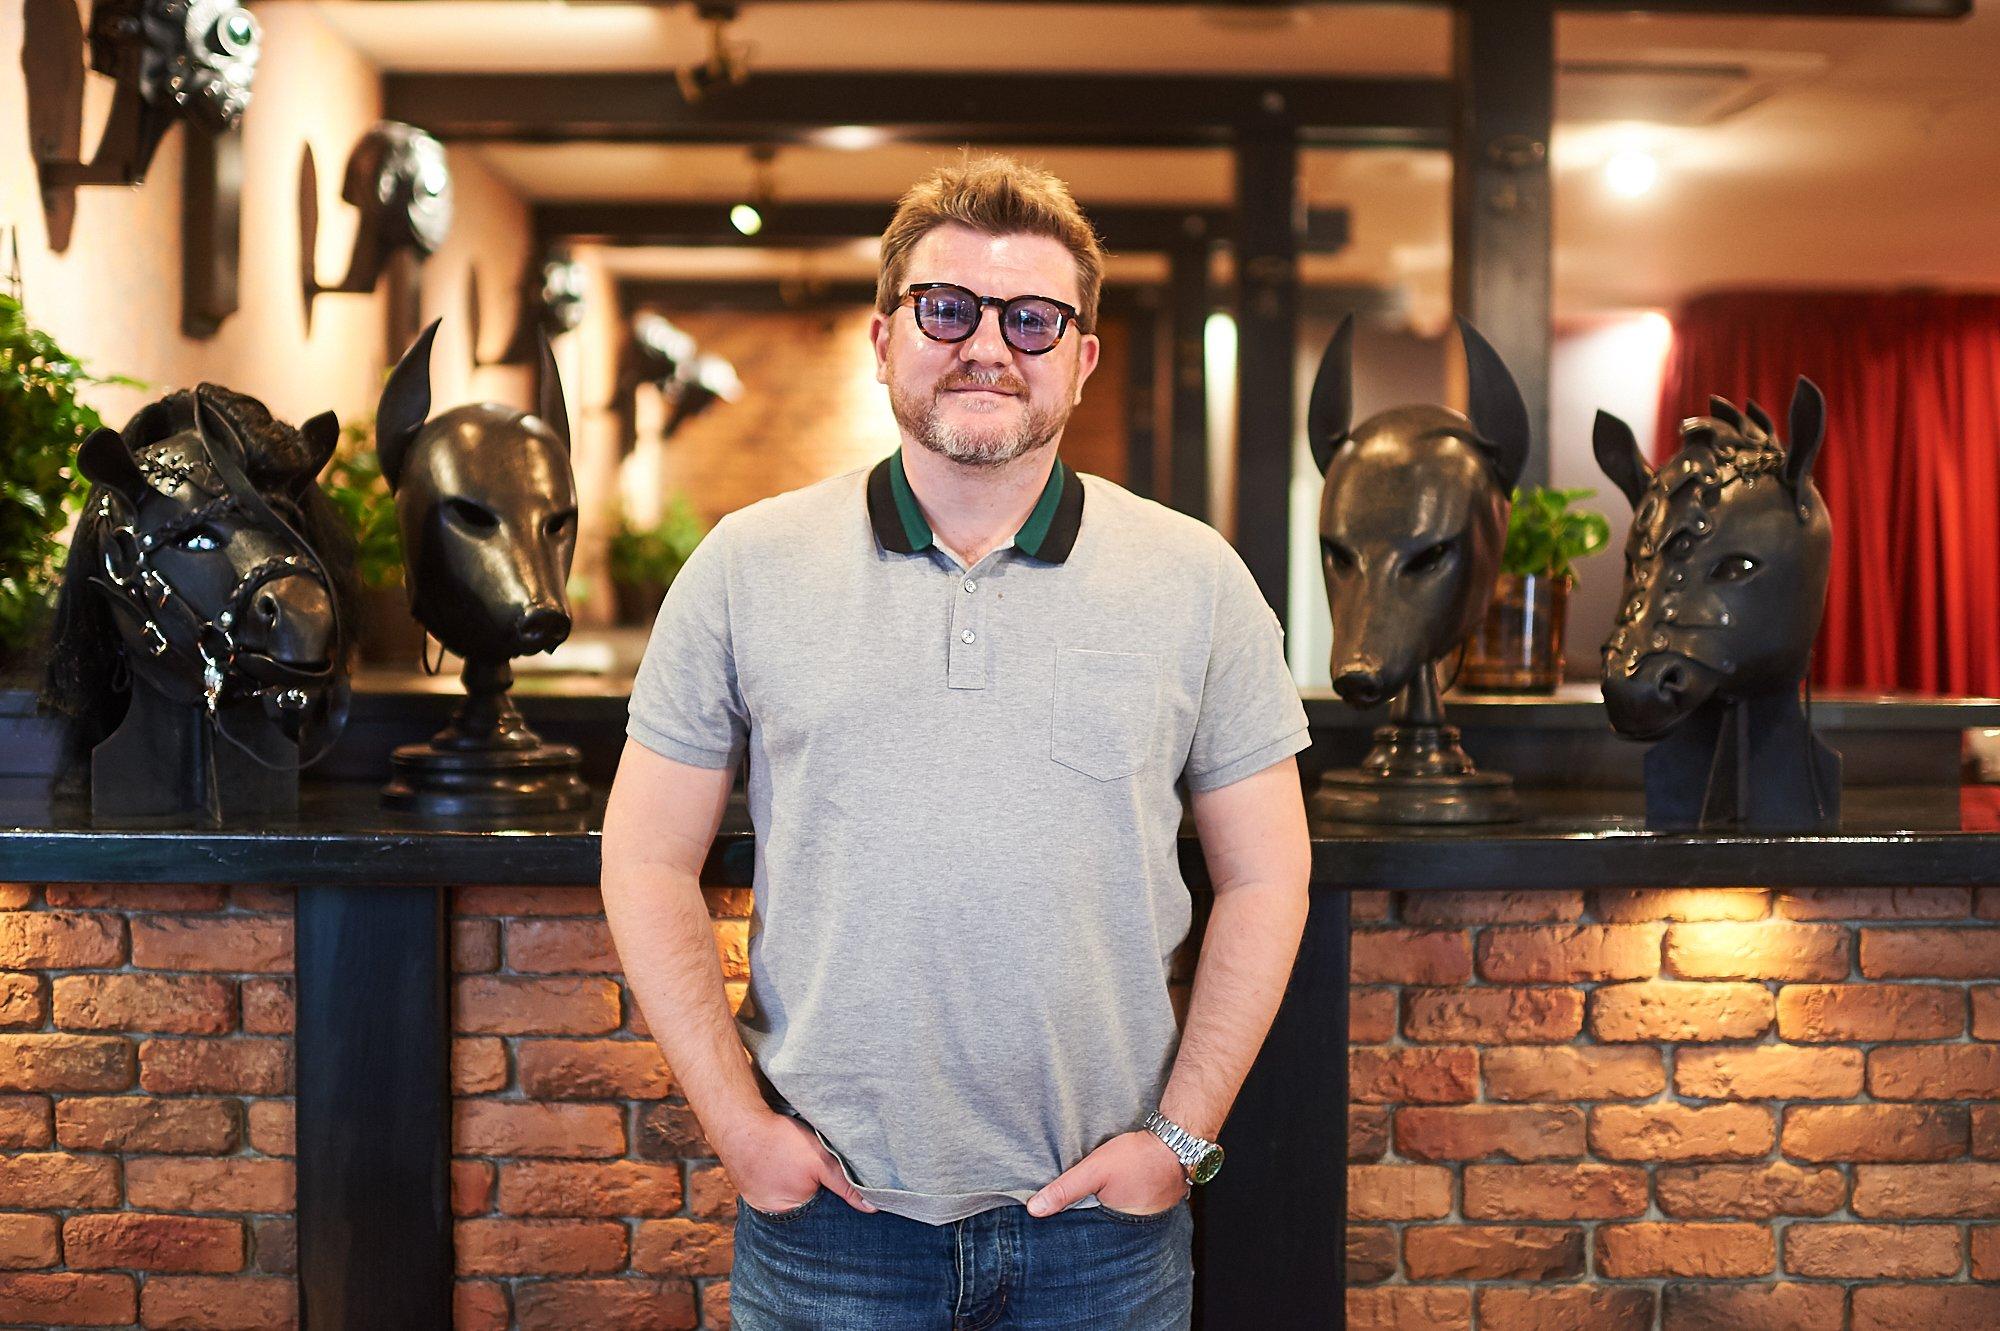 Borysov cooking boxes и 1 euro delivery: киевский ресторатор Дима Борисов о новых проектах и будущем фуд-индустрии